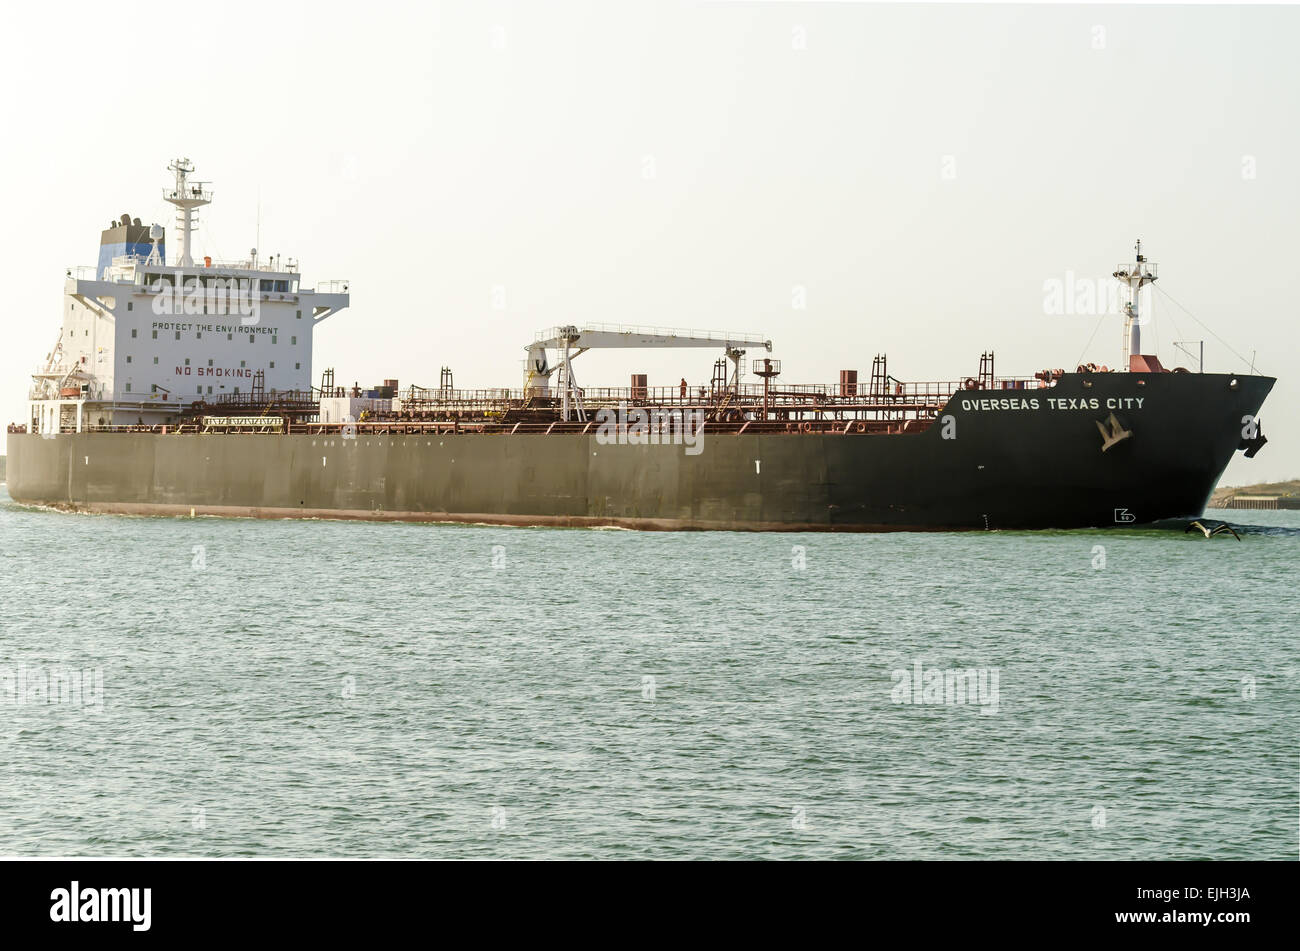 OVERSEAS TEXAS CITY TANKER Gross Tonnage: 29242 Summer DWT: 46803 t Built 2008 Flag: U.S.A. Home port: WILMINGTON - Stock Image